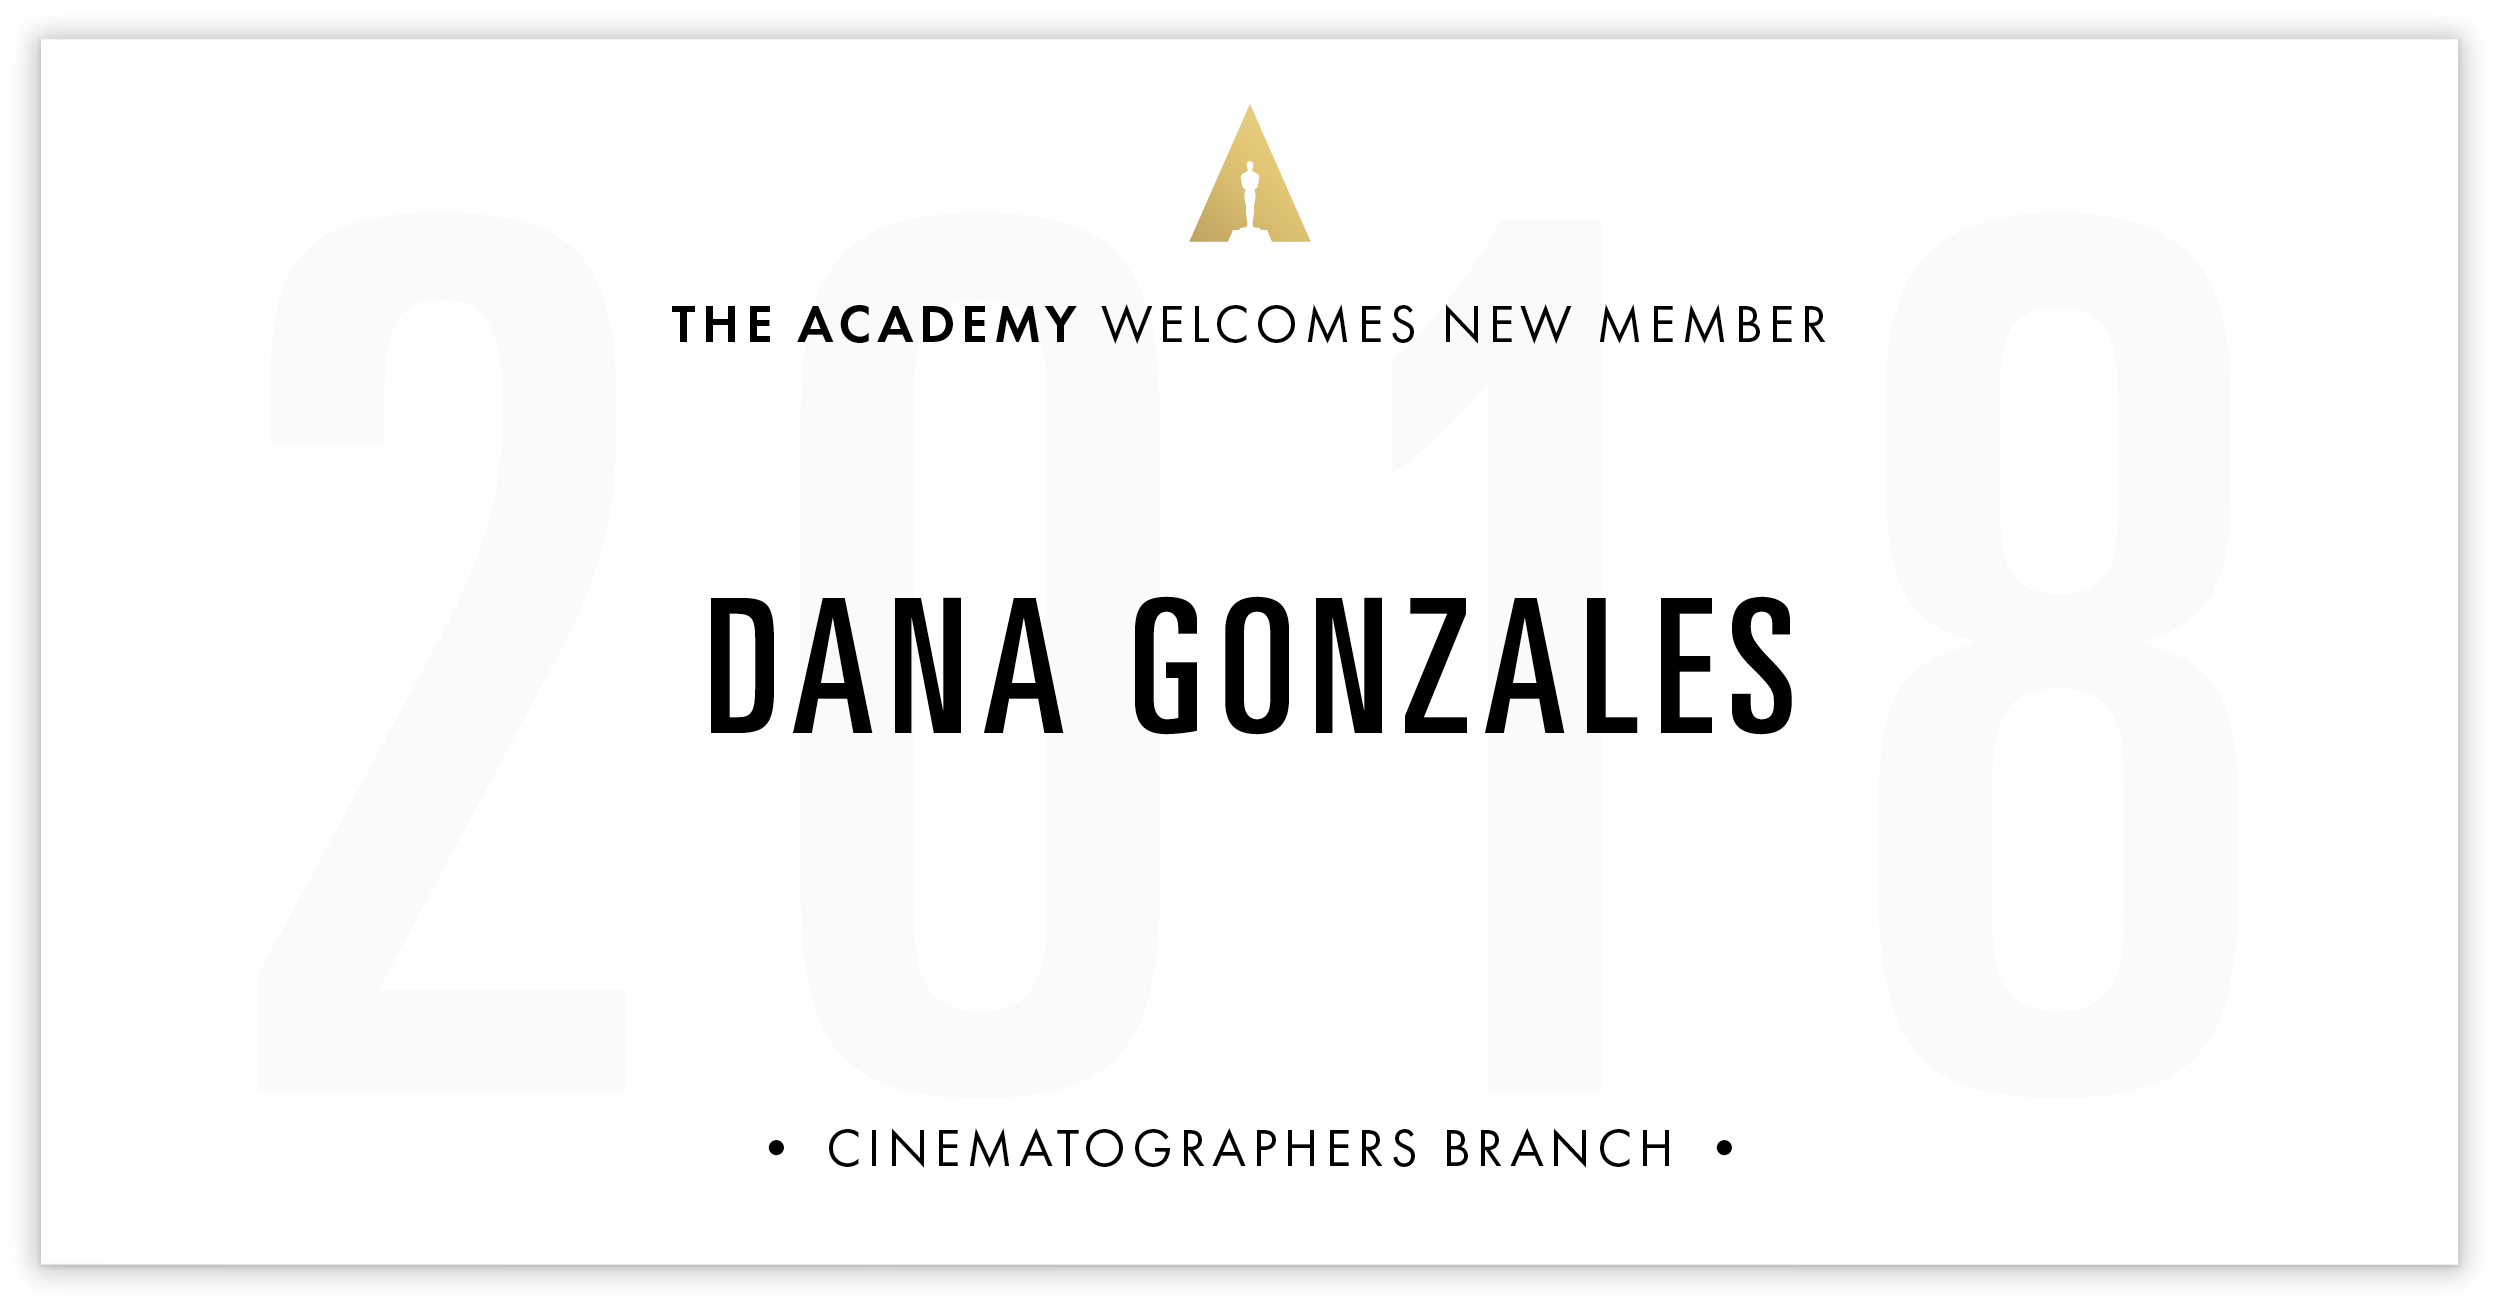 Dana Gonzales is invited!